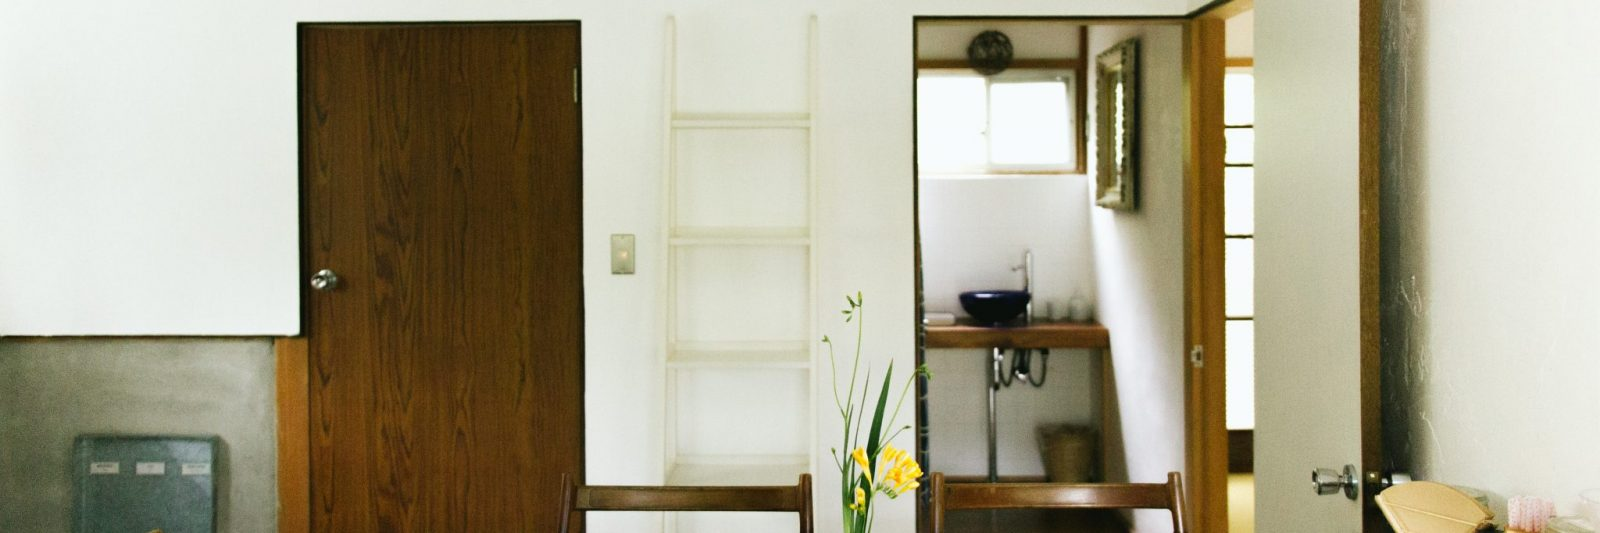 coya cottage kitchen